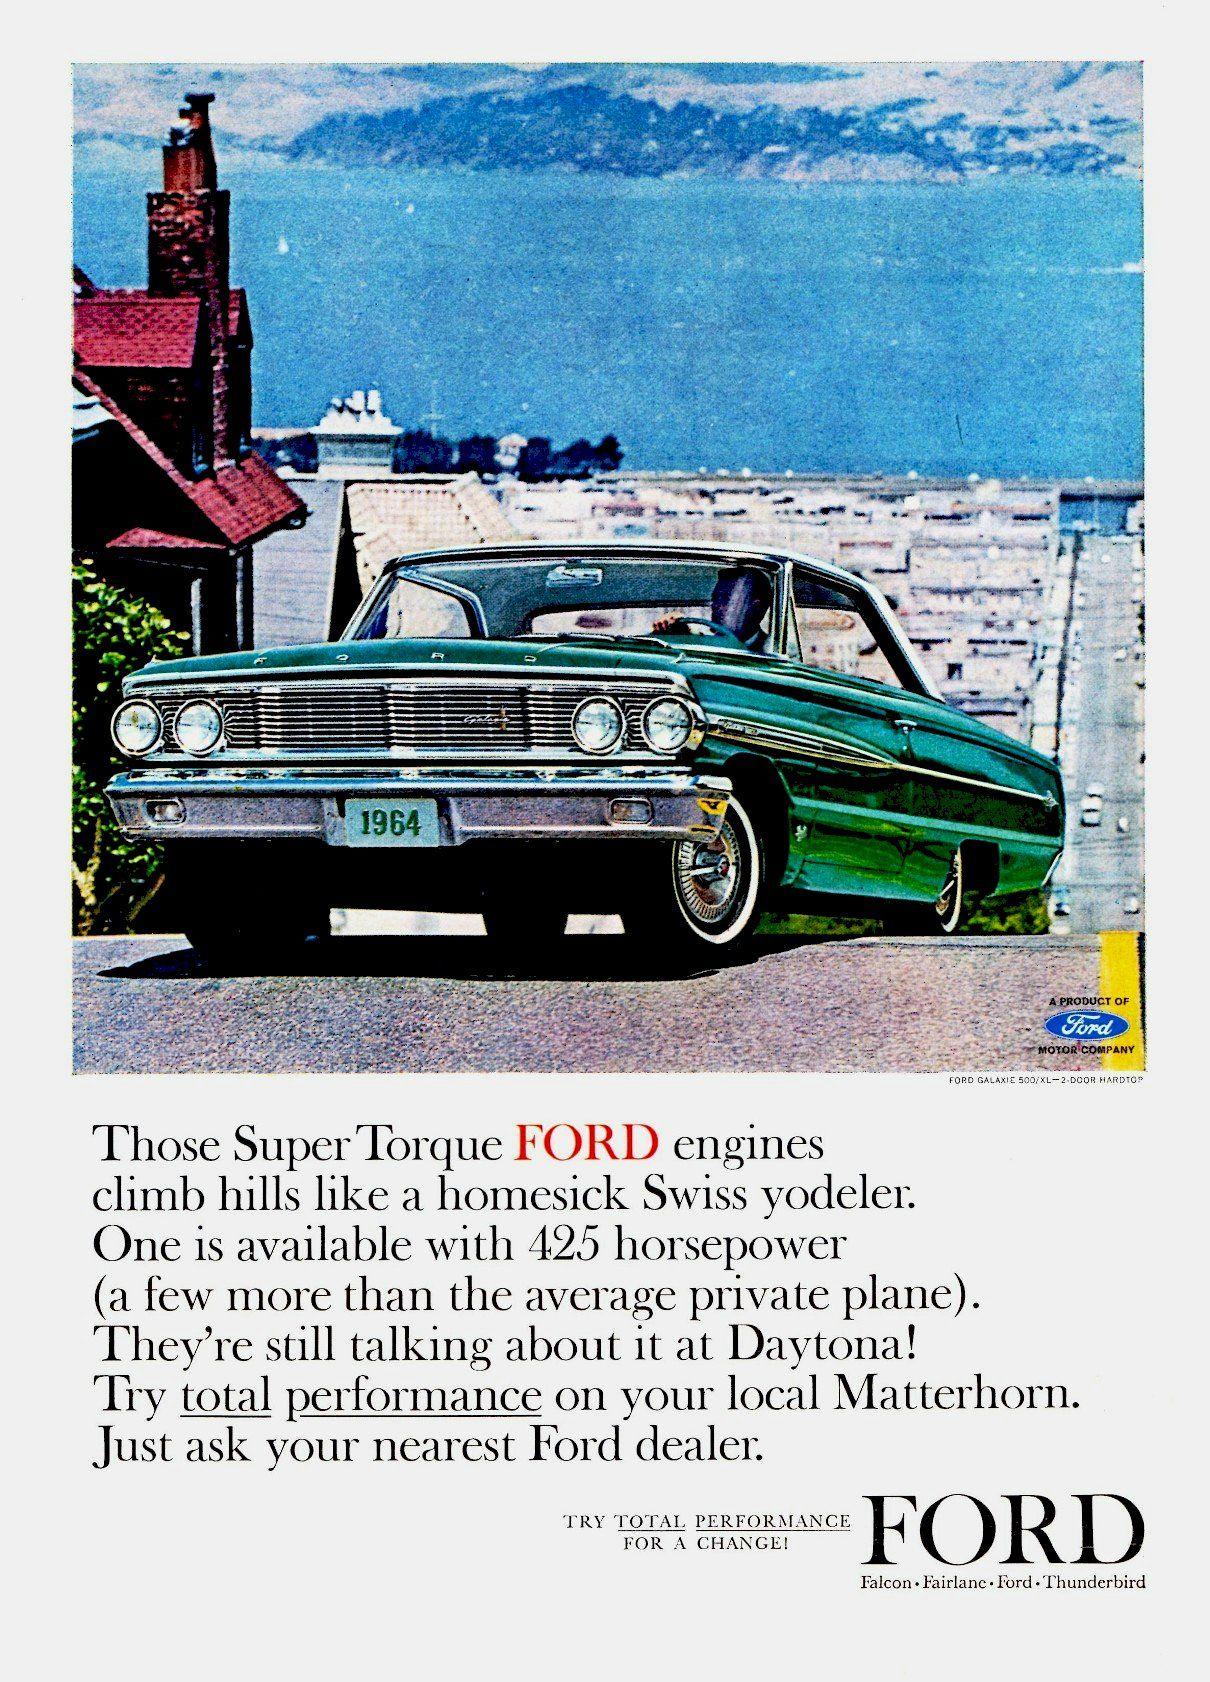 1964 Ford Galaxie 500 Xl 2 Door Hardtop Ford Galaxie Ford Galaxie 500 1964 Ford